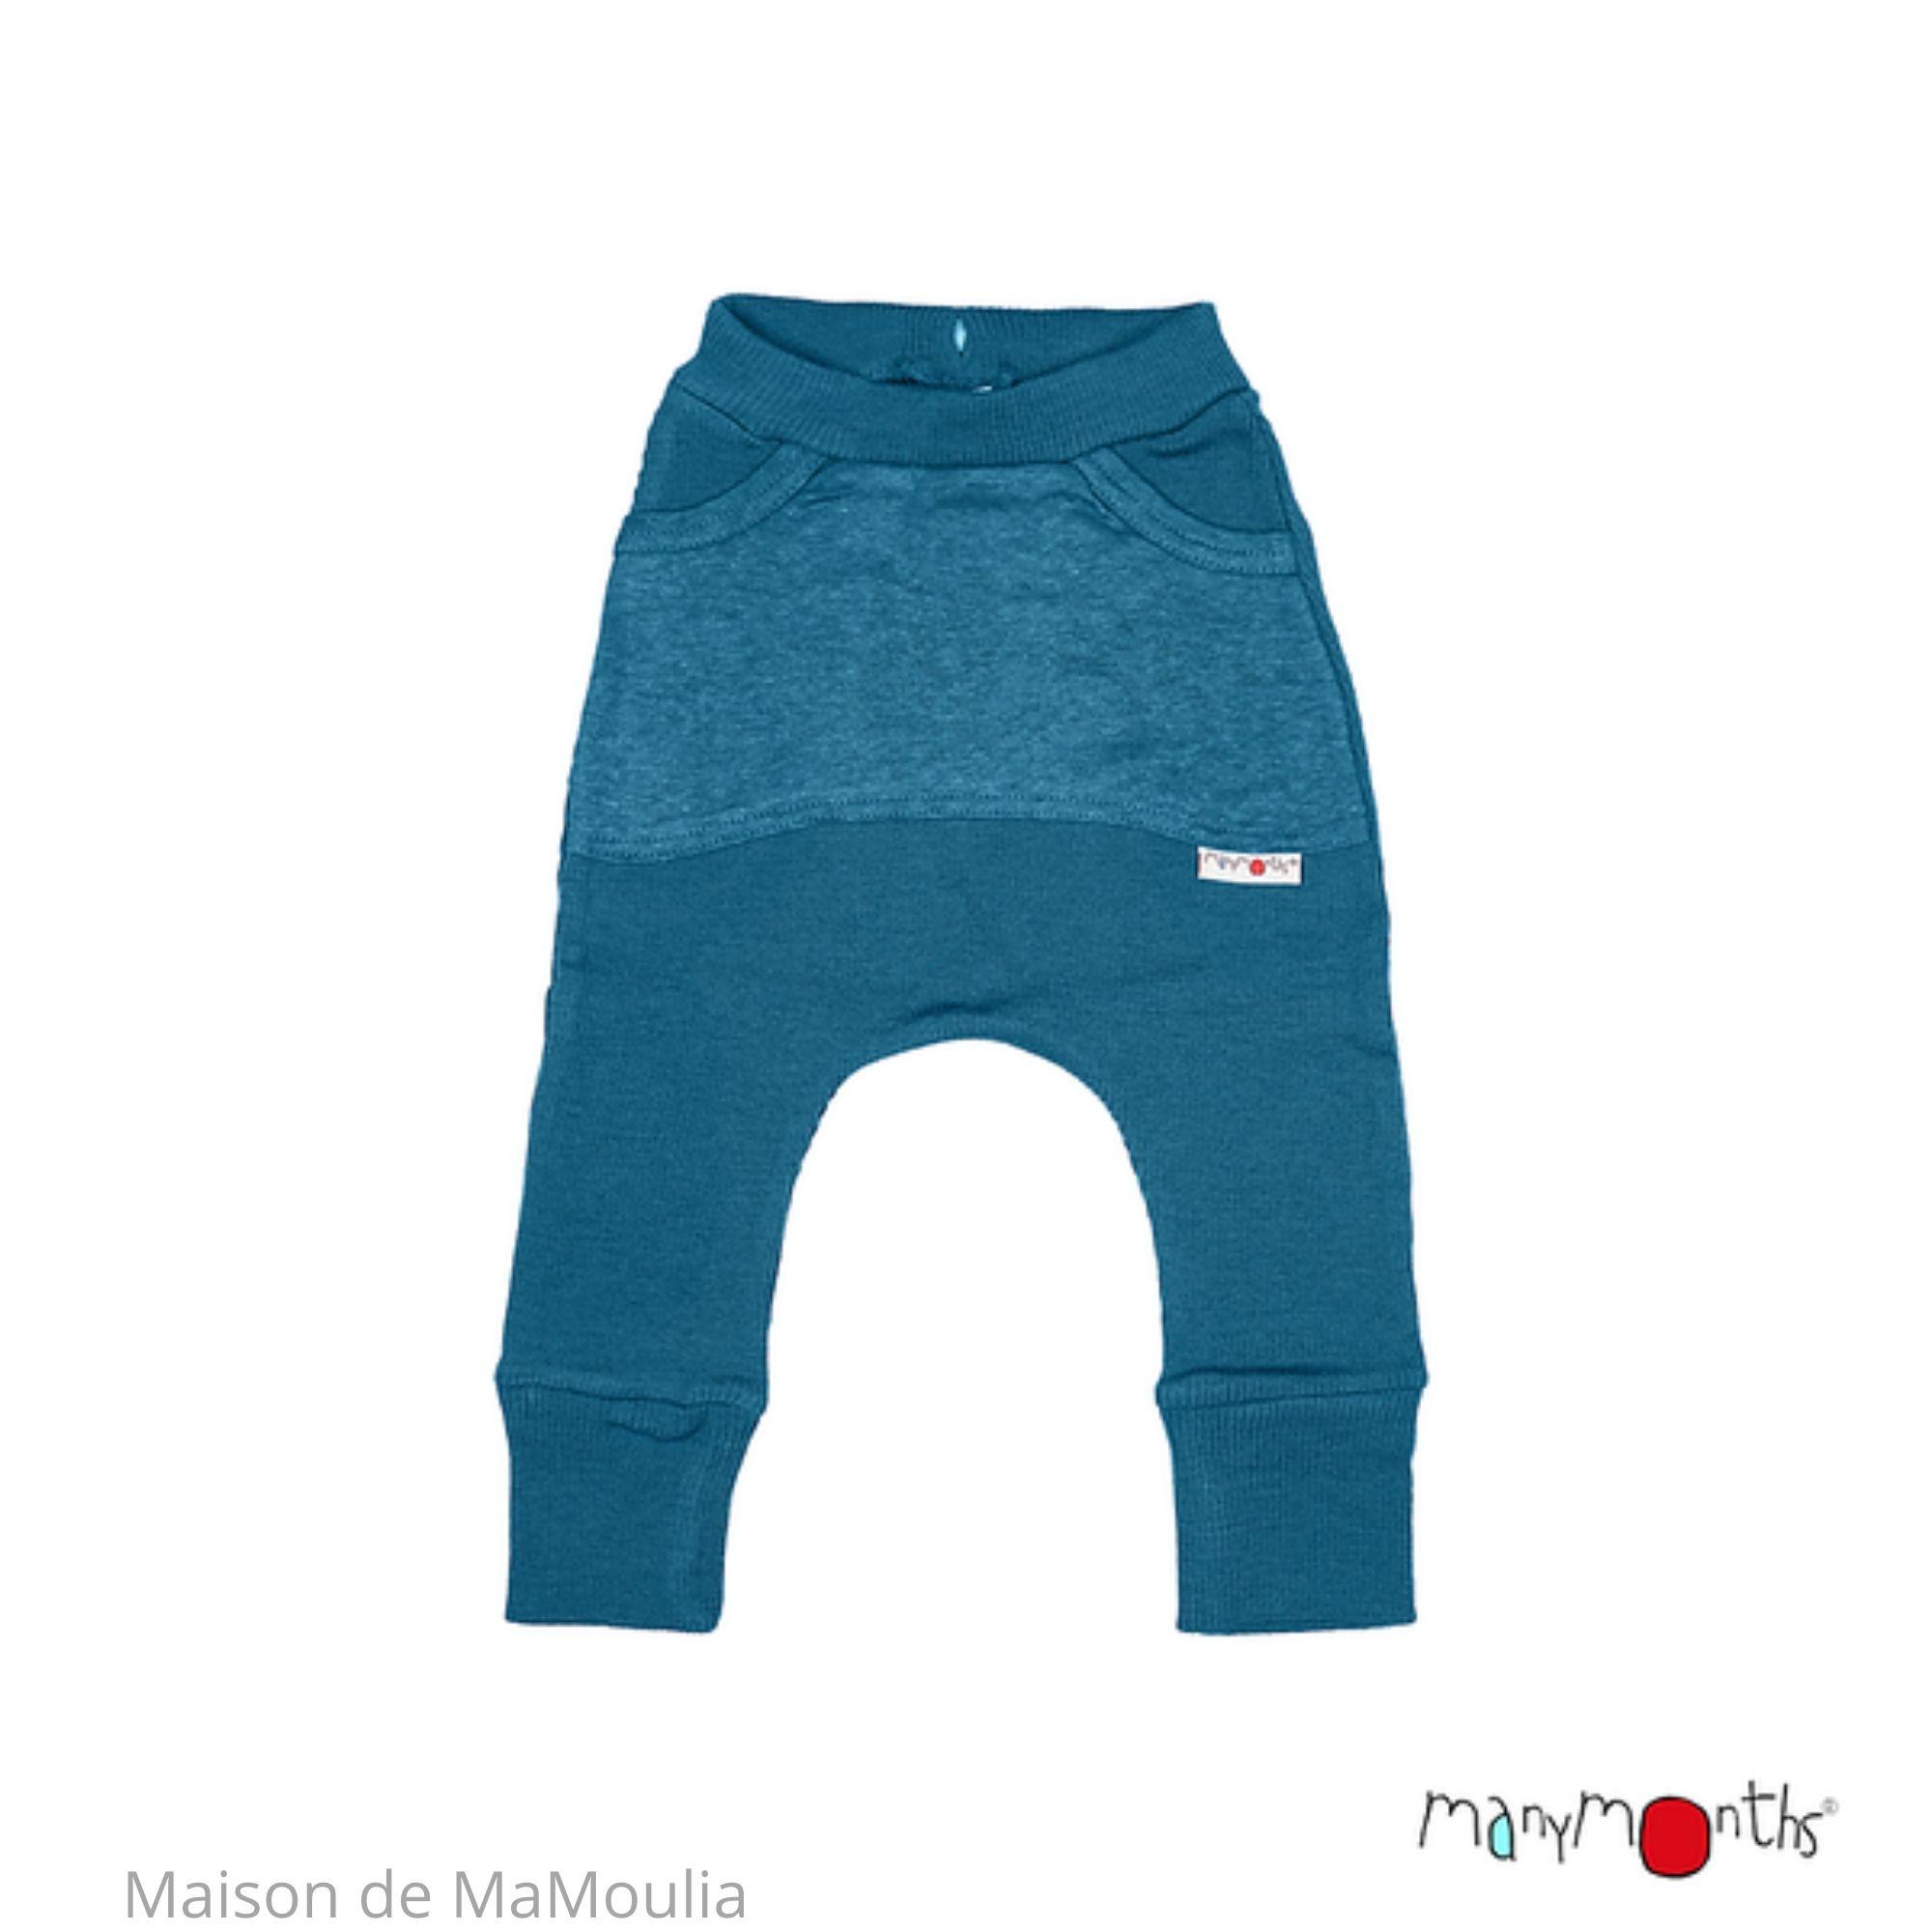 MANYMONTHS - Pantalon Kangaroo avec poche - Laine mérinos